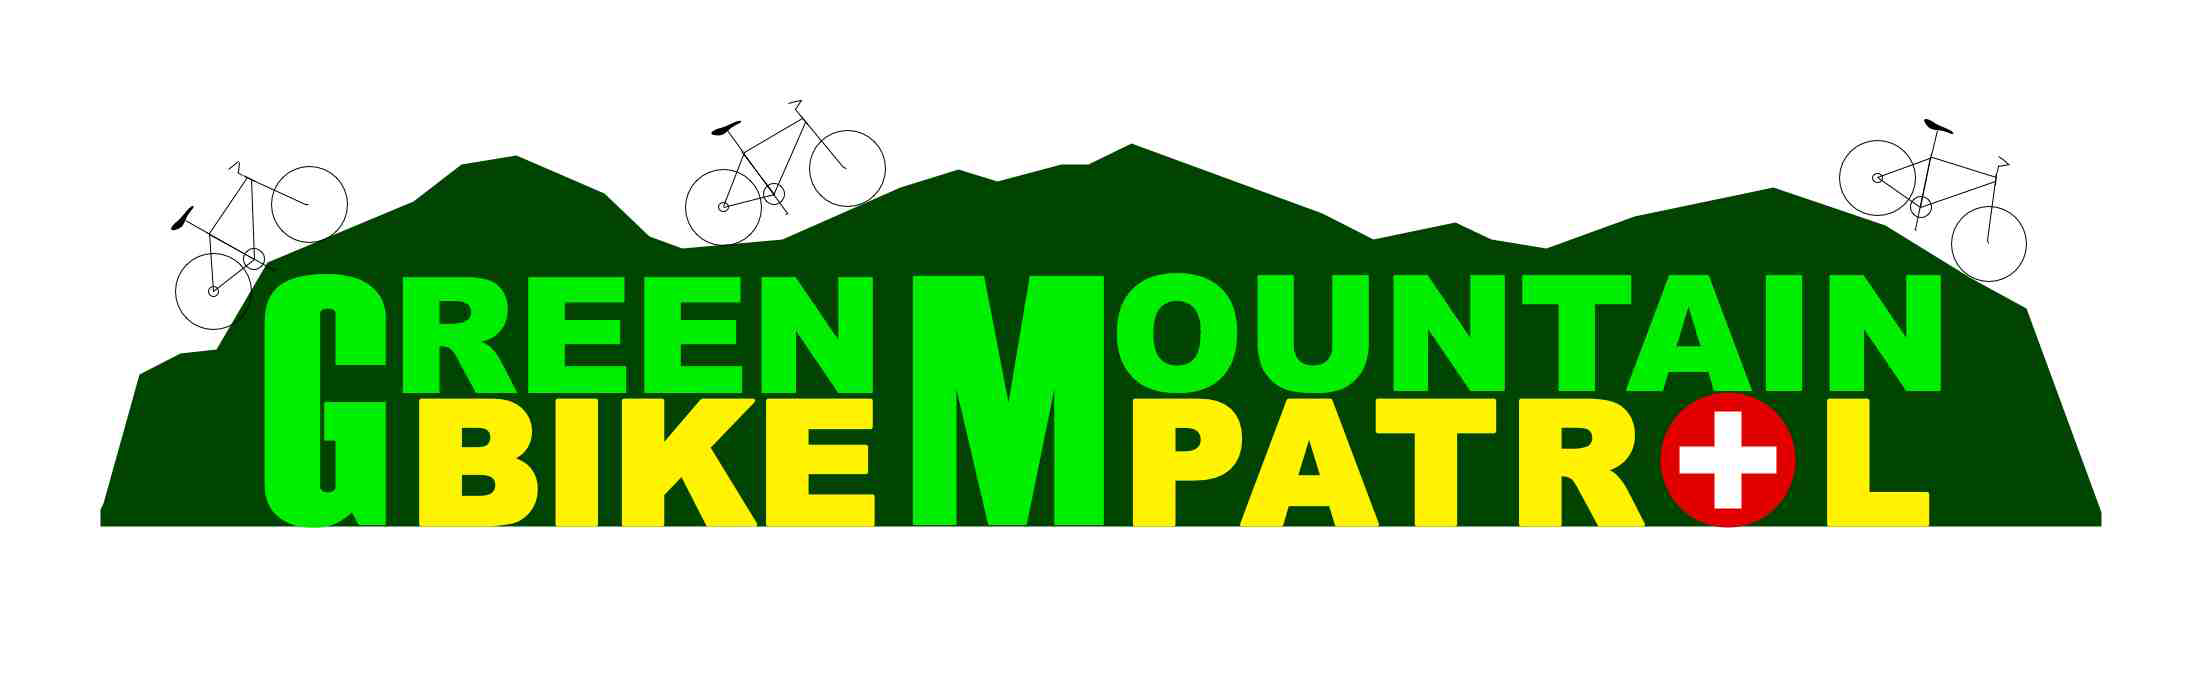 green_mountain_bike_patrol_logo.png